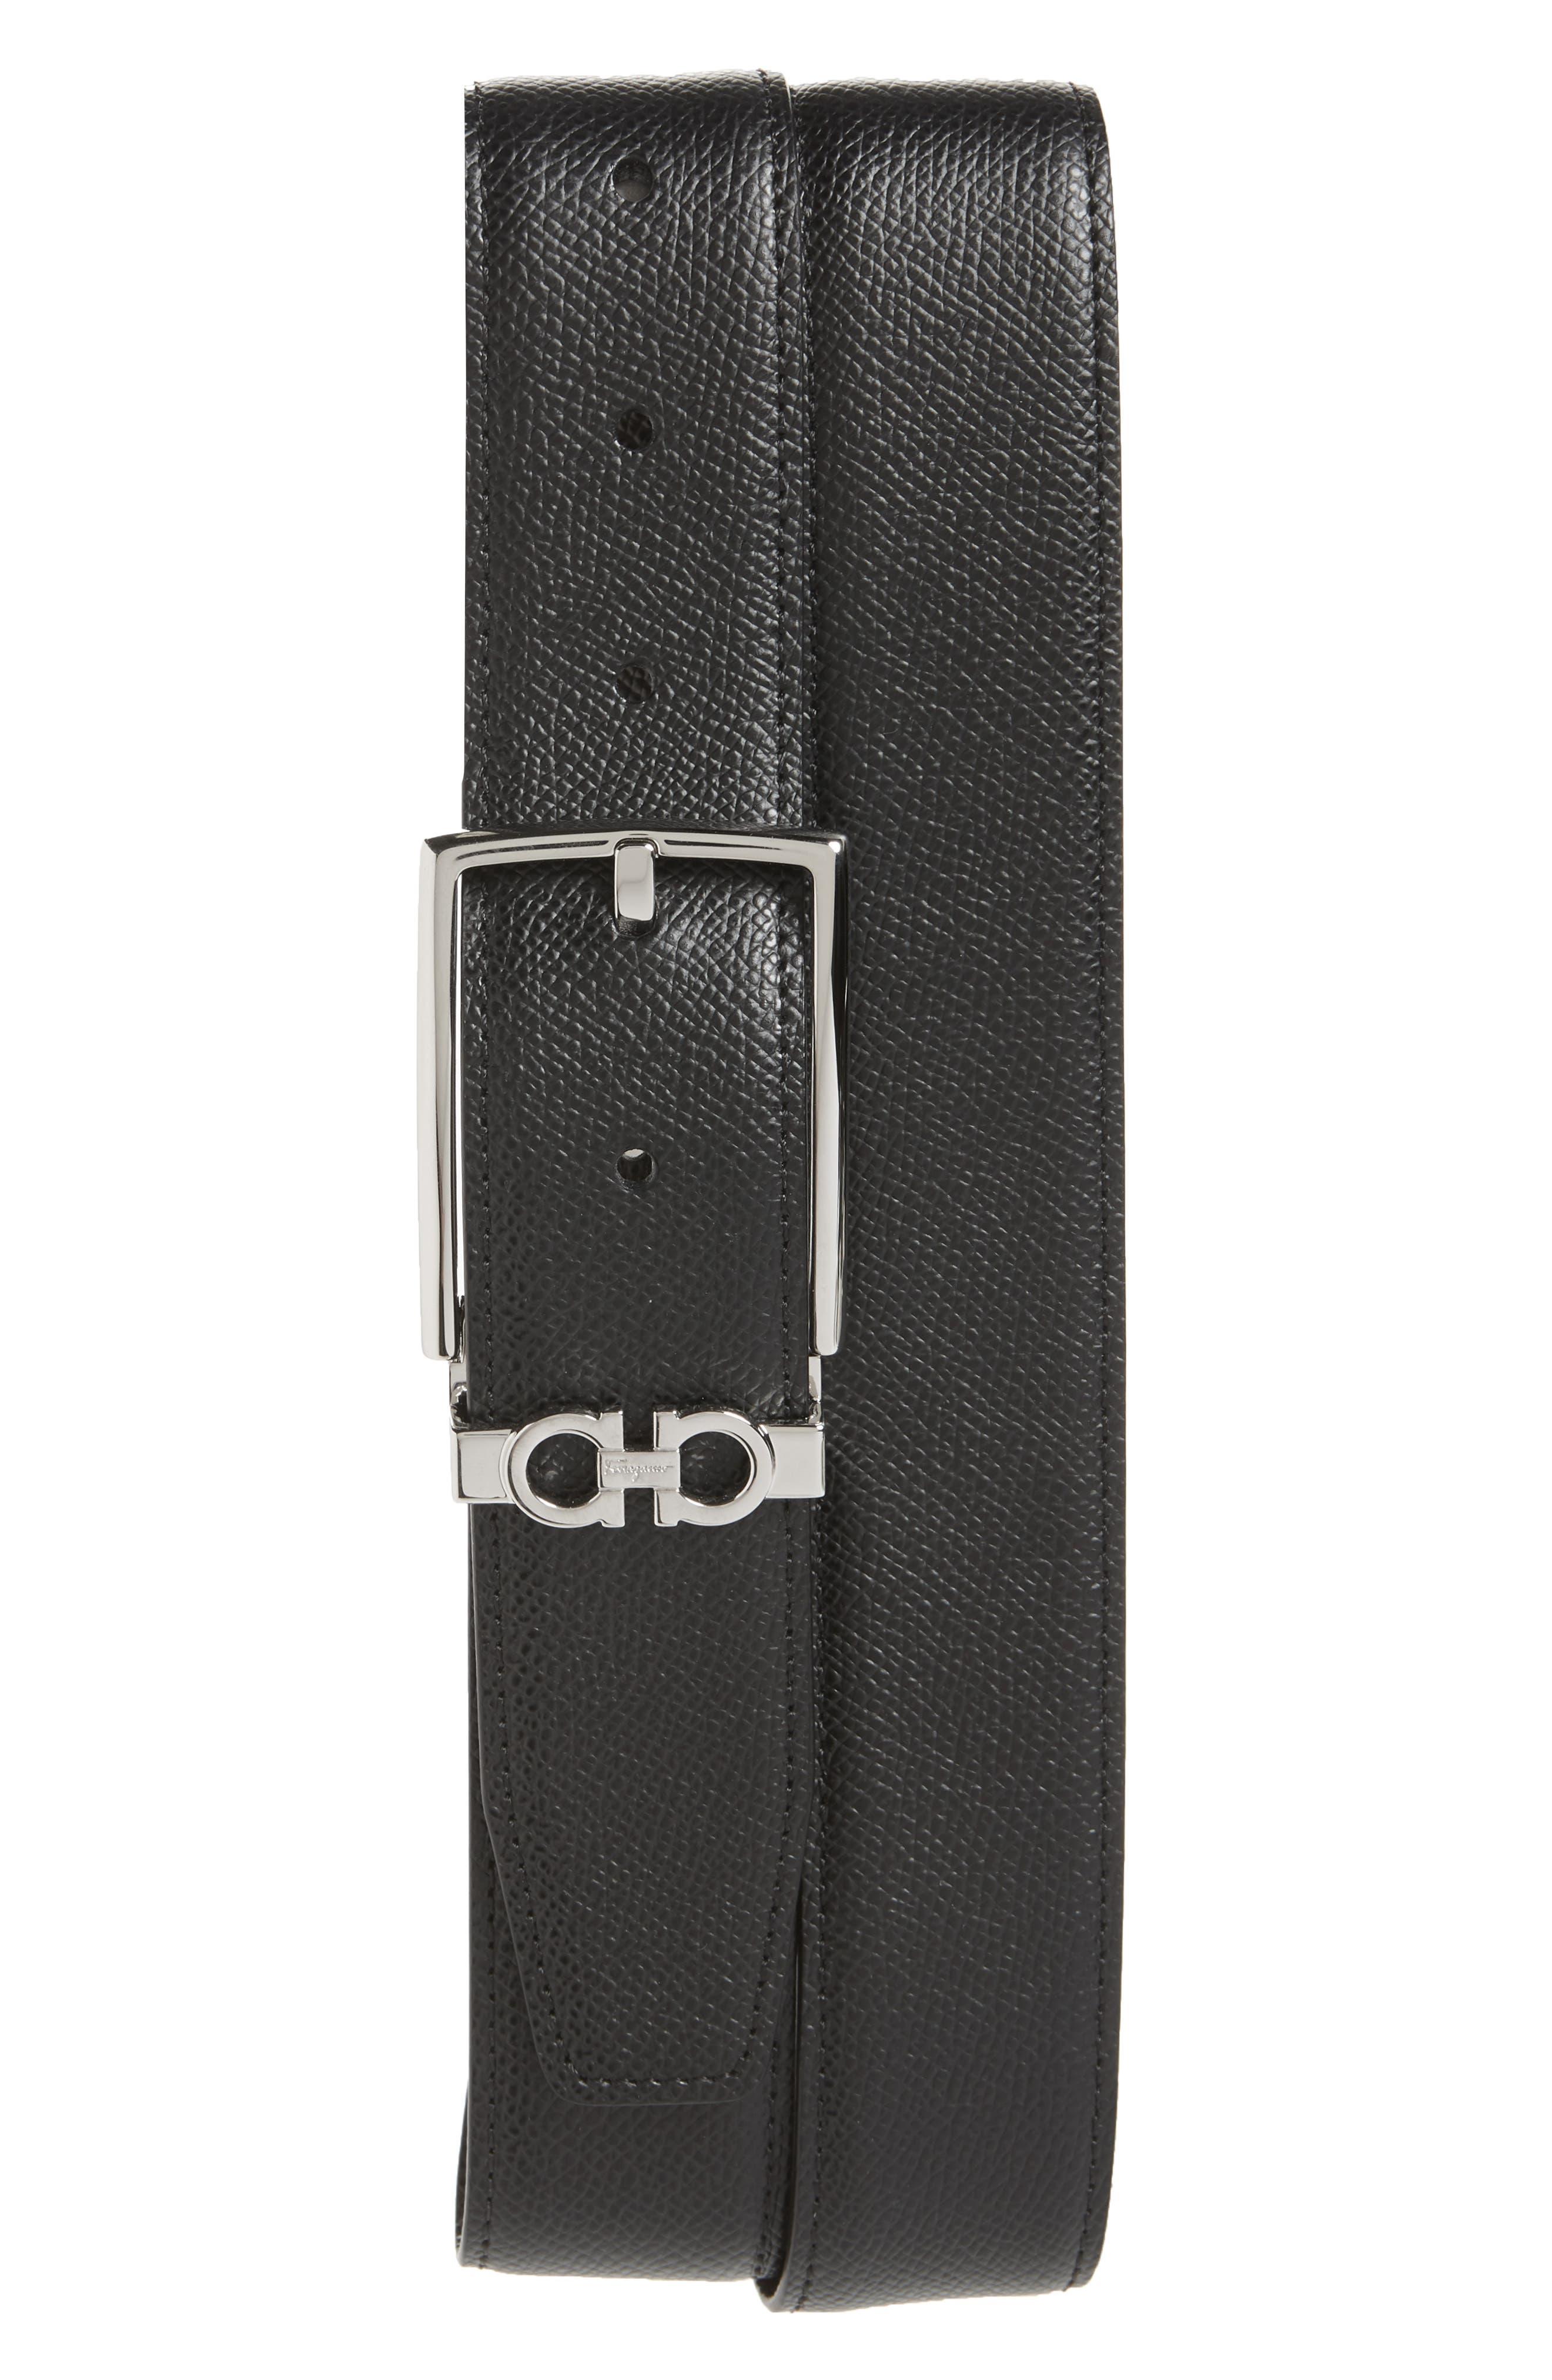 SALVATORE FERRAGAMO, Reversible Leather Belt, Main thumbnail 1, color, NERO / T.MORO